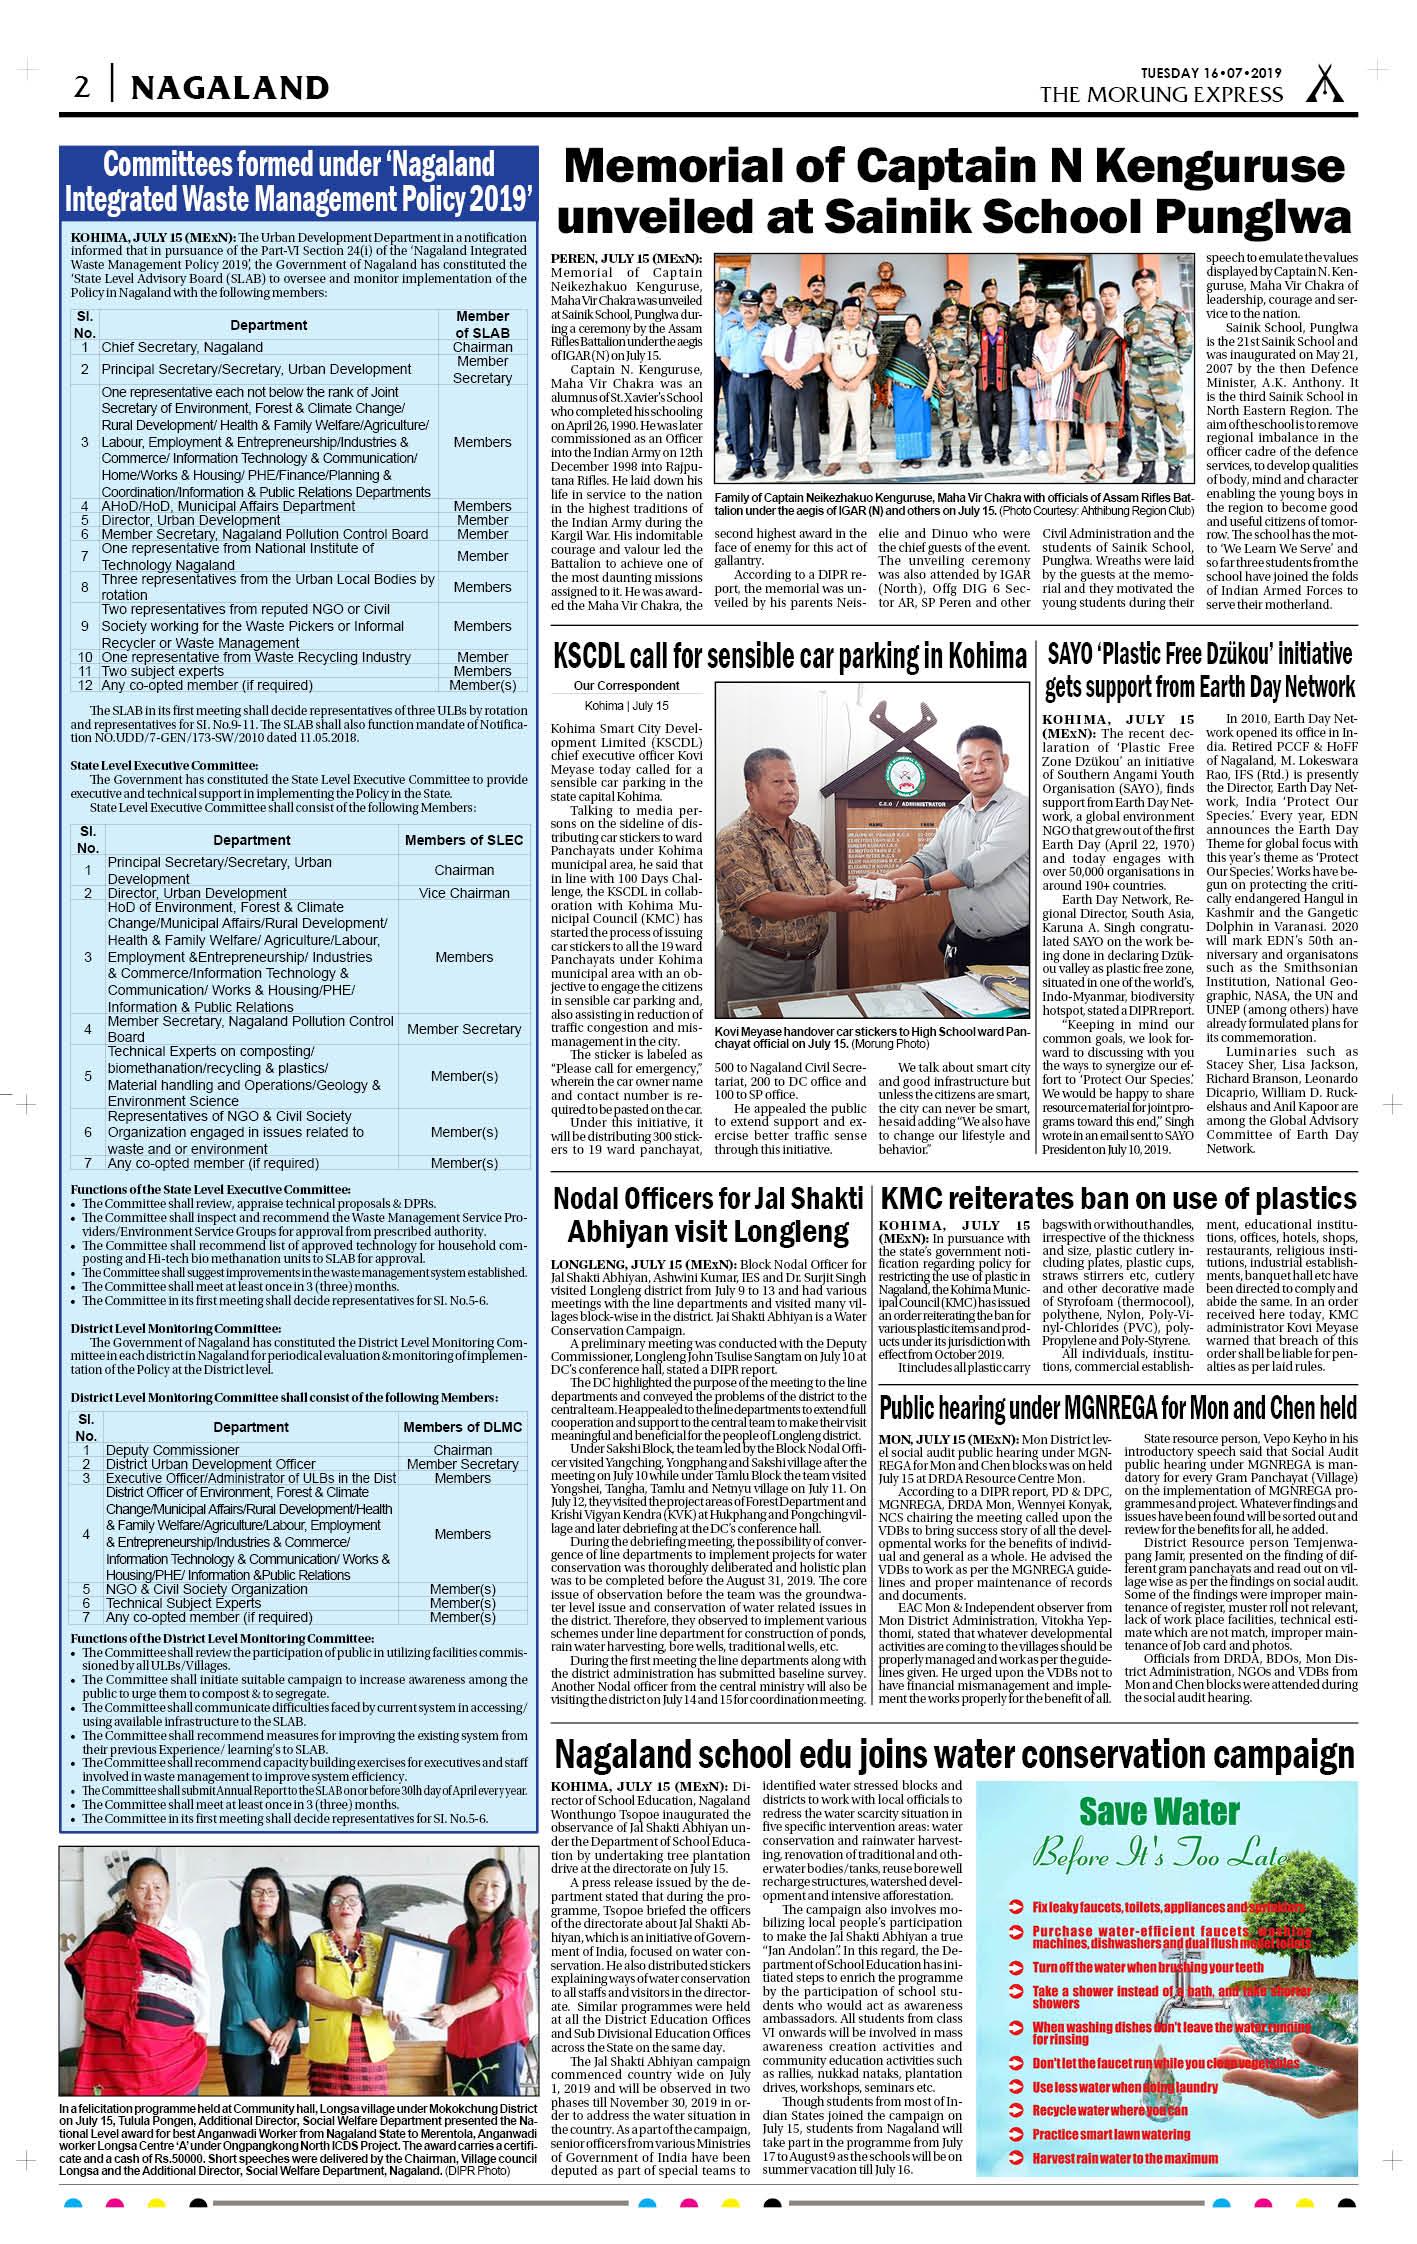 July 16, 2019 Page: 2 - The Morung Express E-Paper - Morung